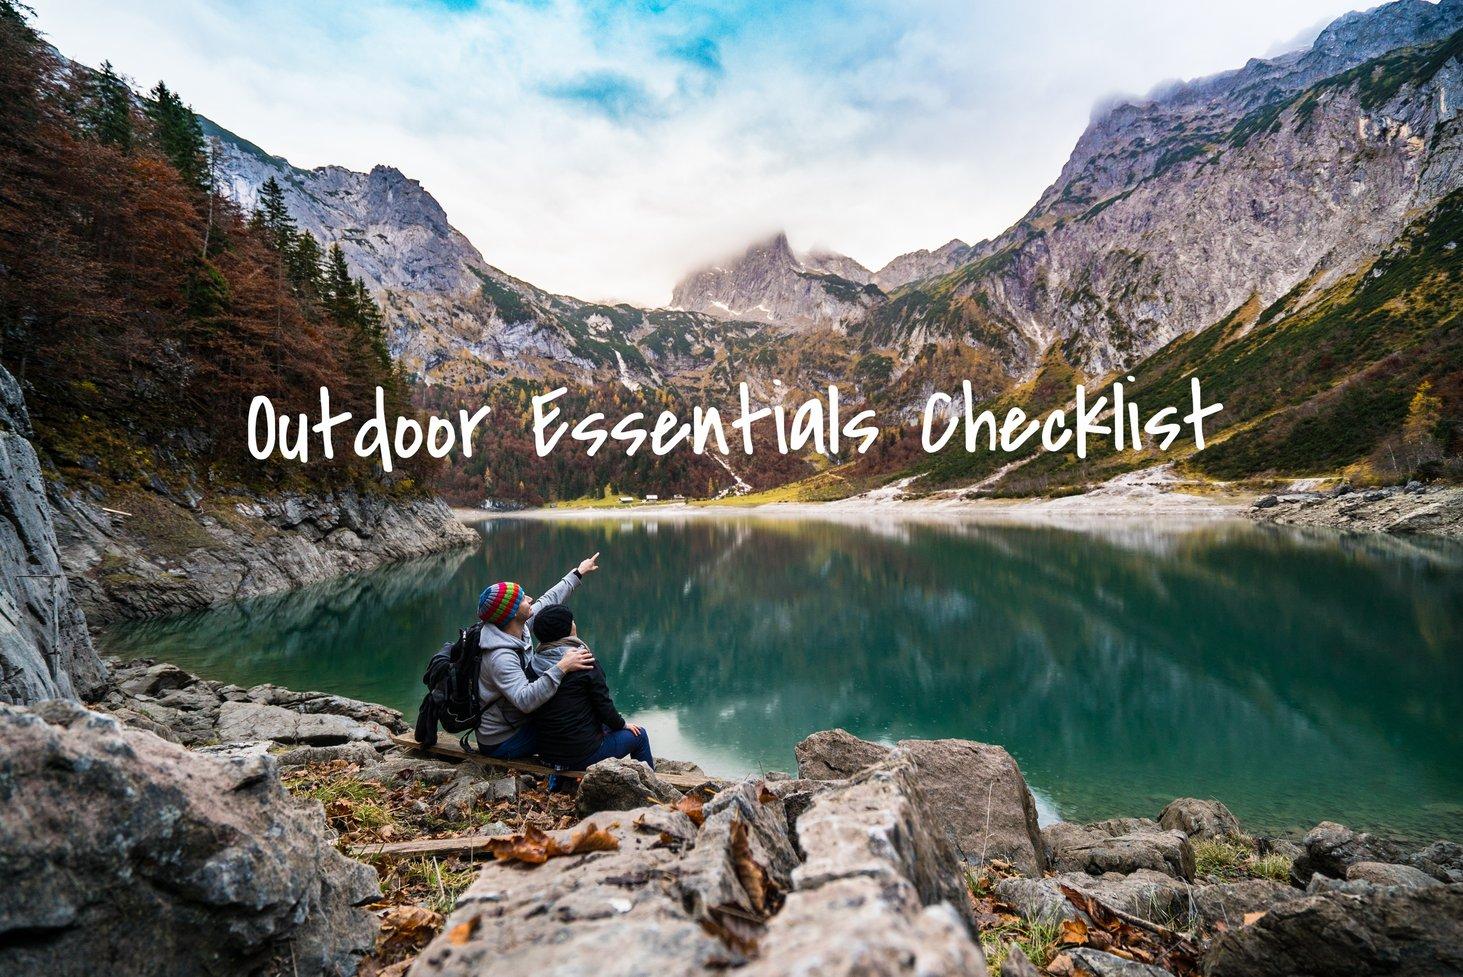 Outdoor-essentials-checklist-items-you-need